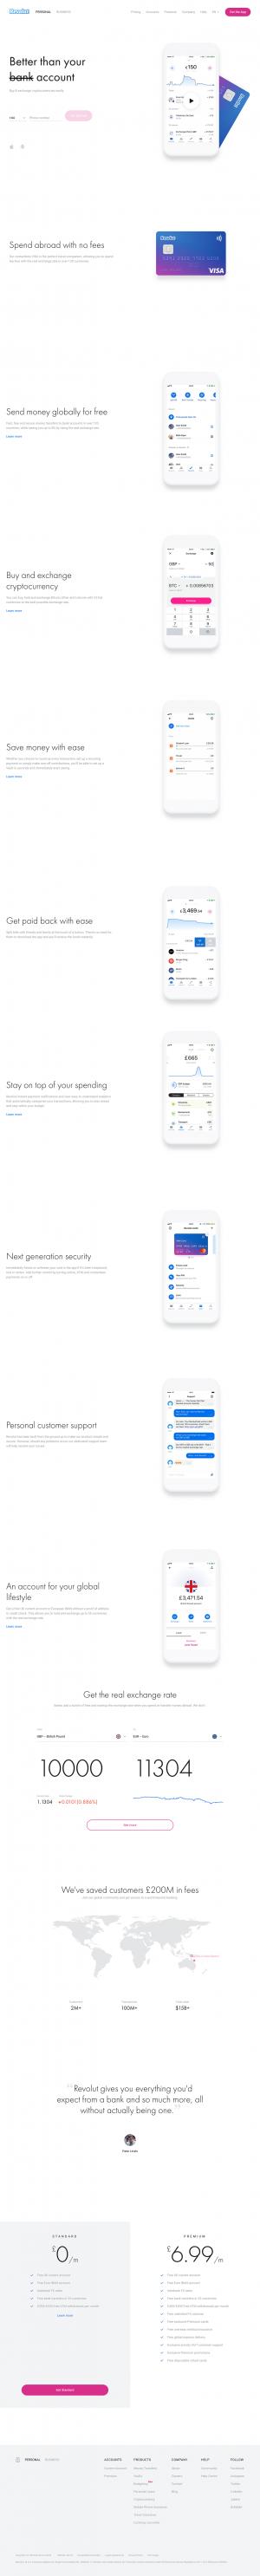 Revolut Screenshot